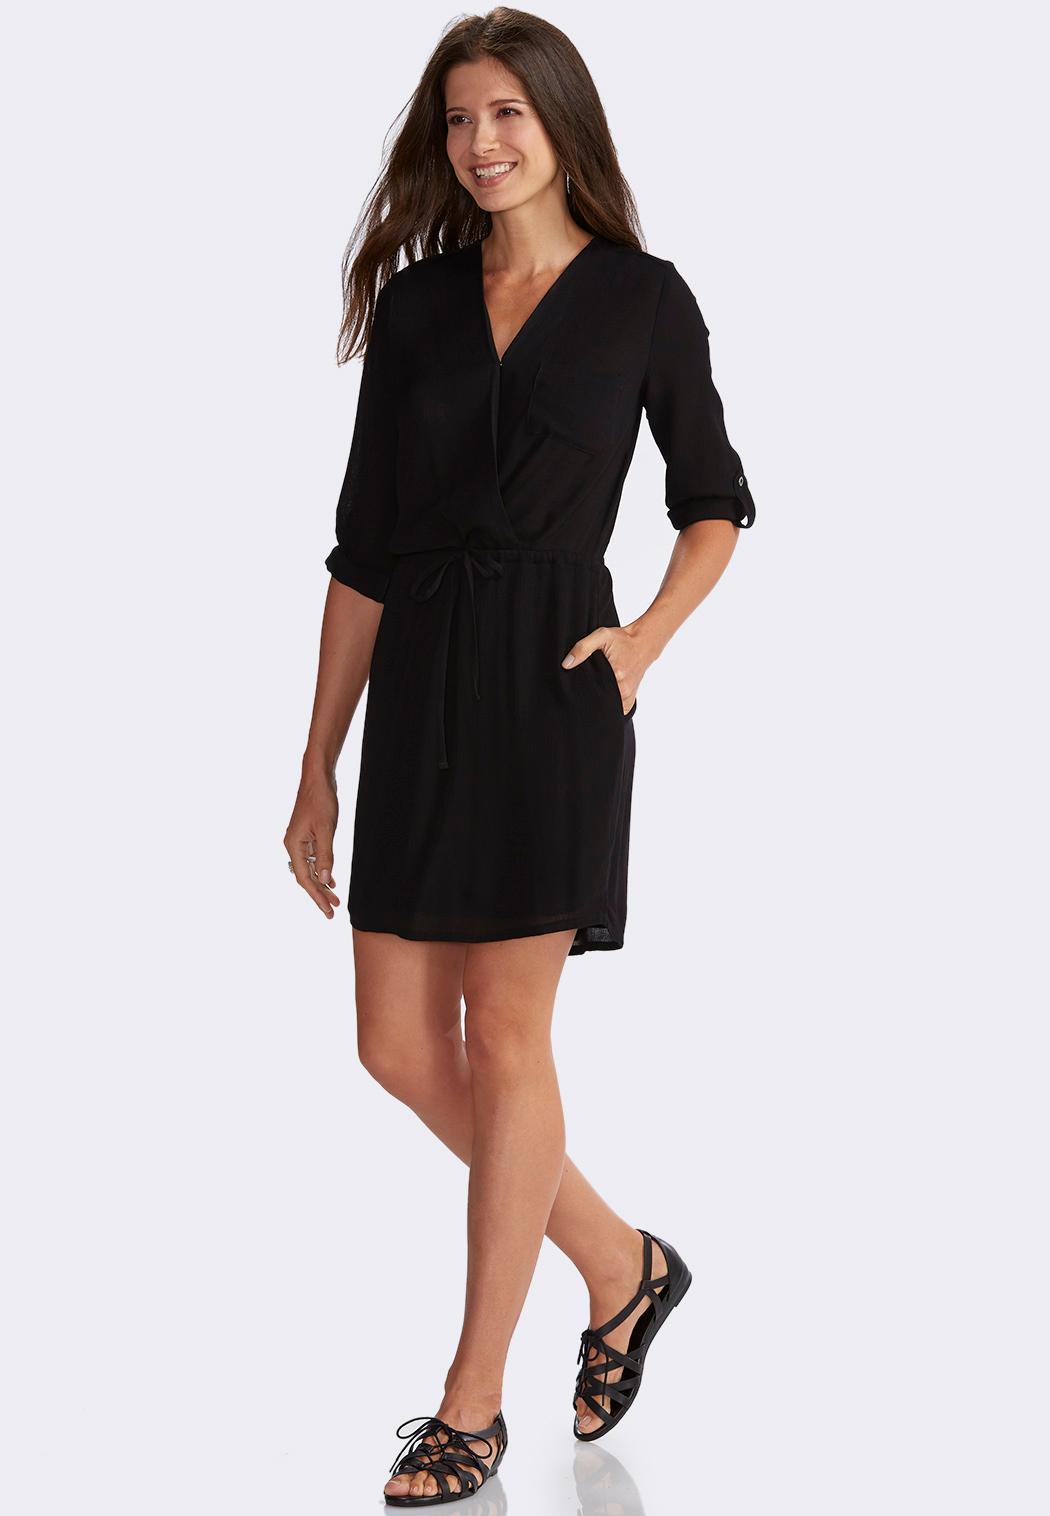 Surplice Drawstring Shirt Dress-Plus Plus Sizes Cato Fashions